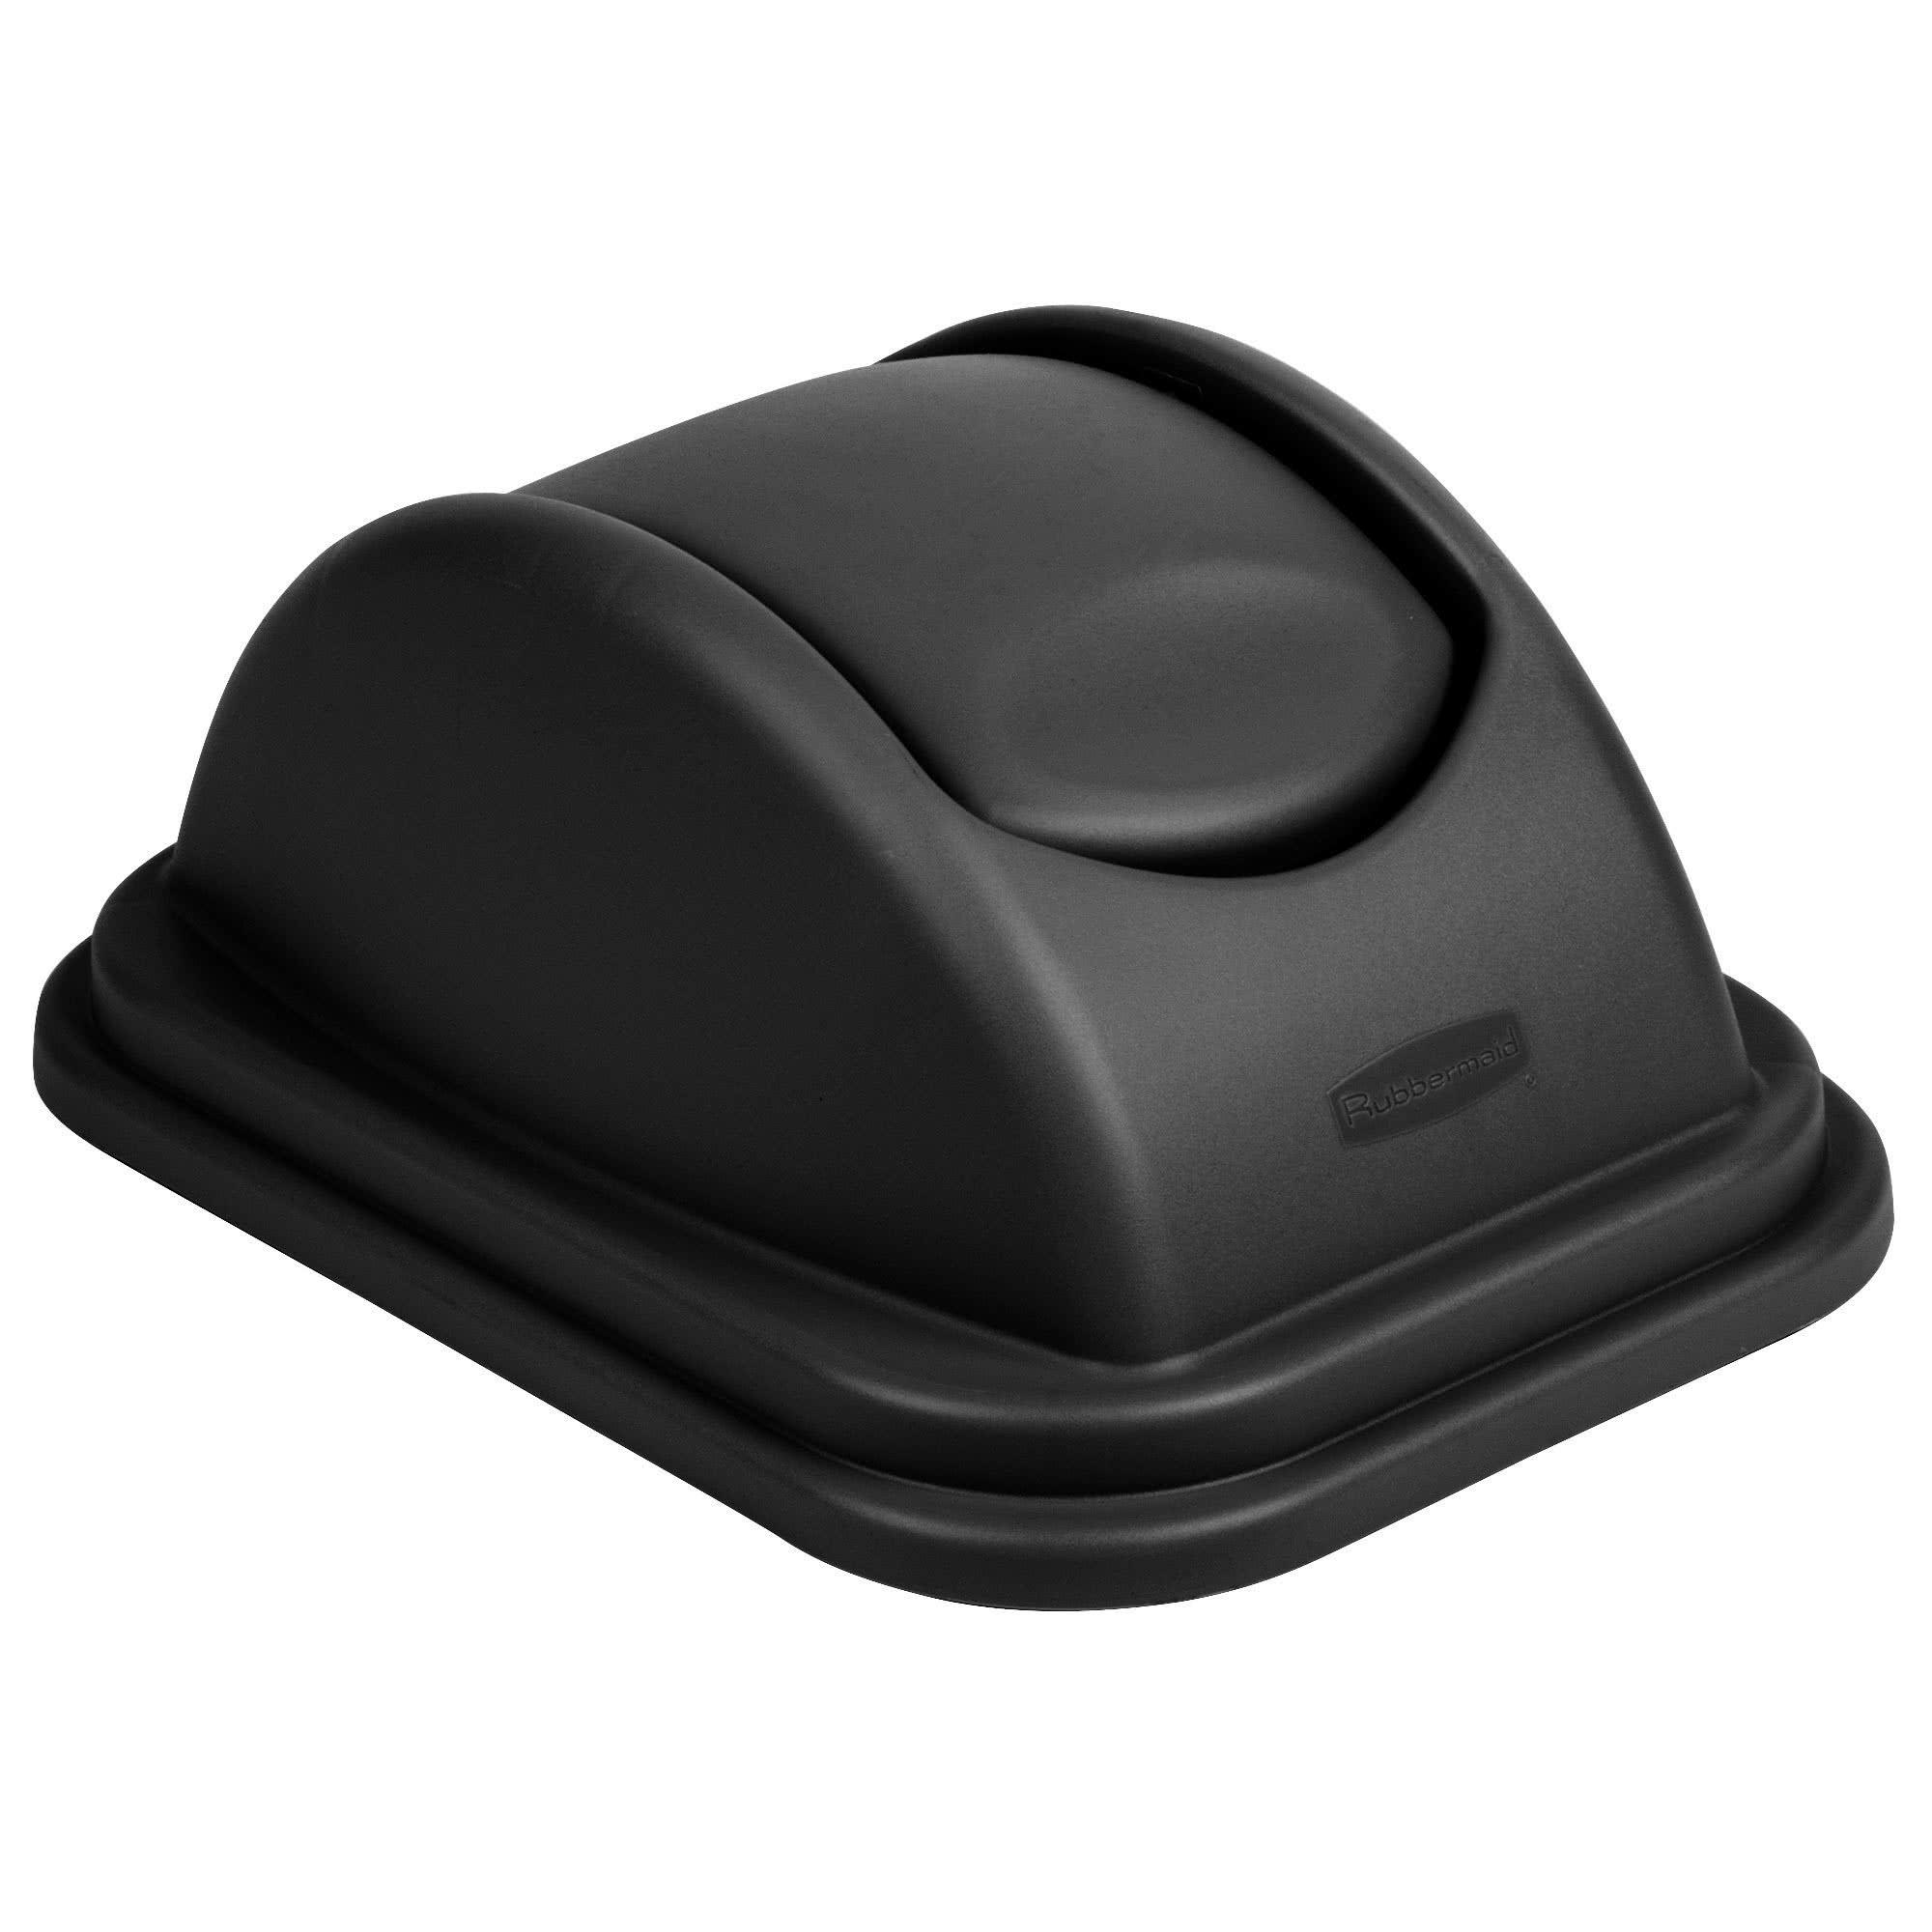 Rubbermaid FG306700BLA tapa untouchable soft abatible color negro, aplica contenedor FG295700 de 10 galones  1